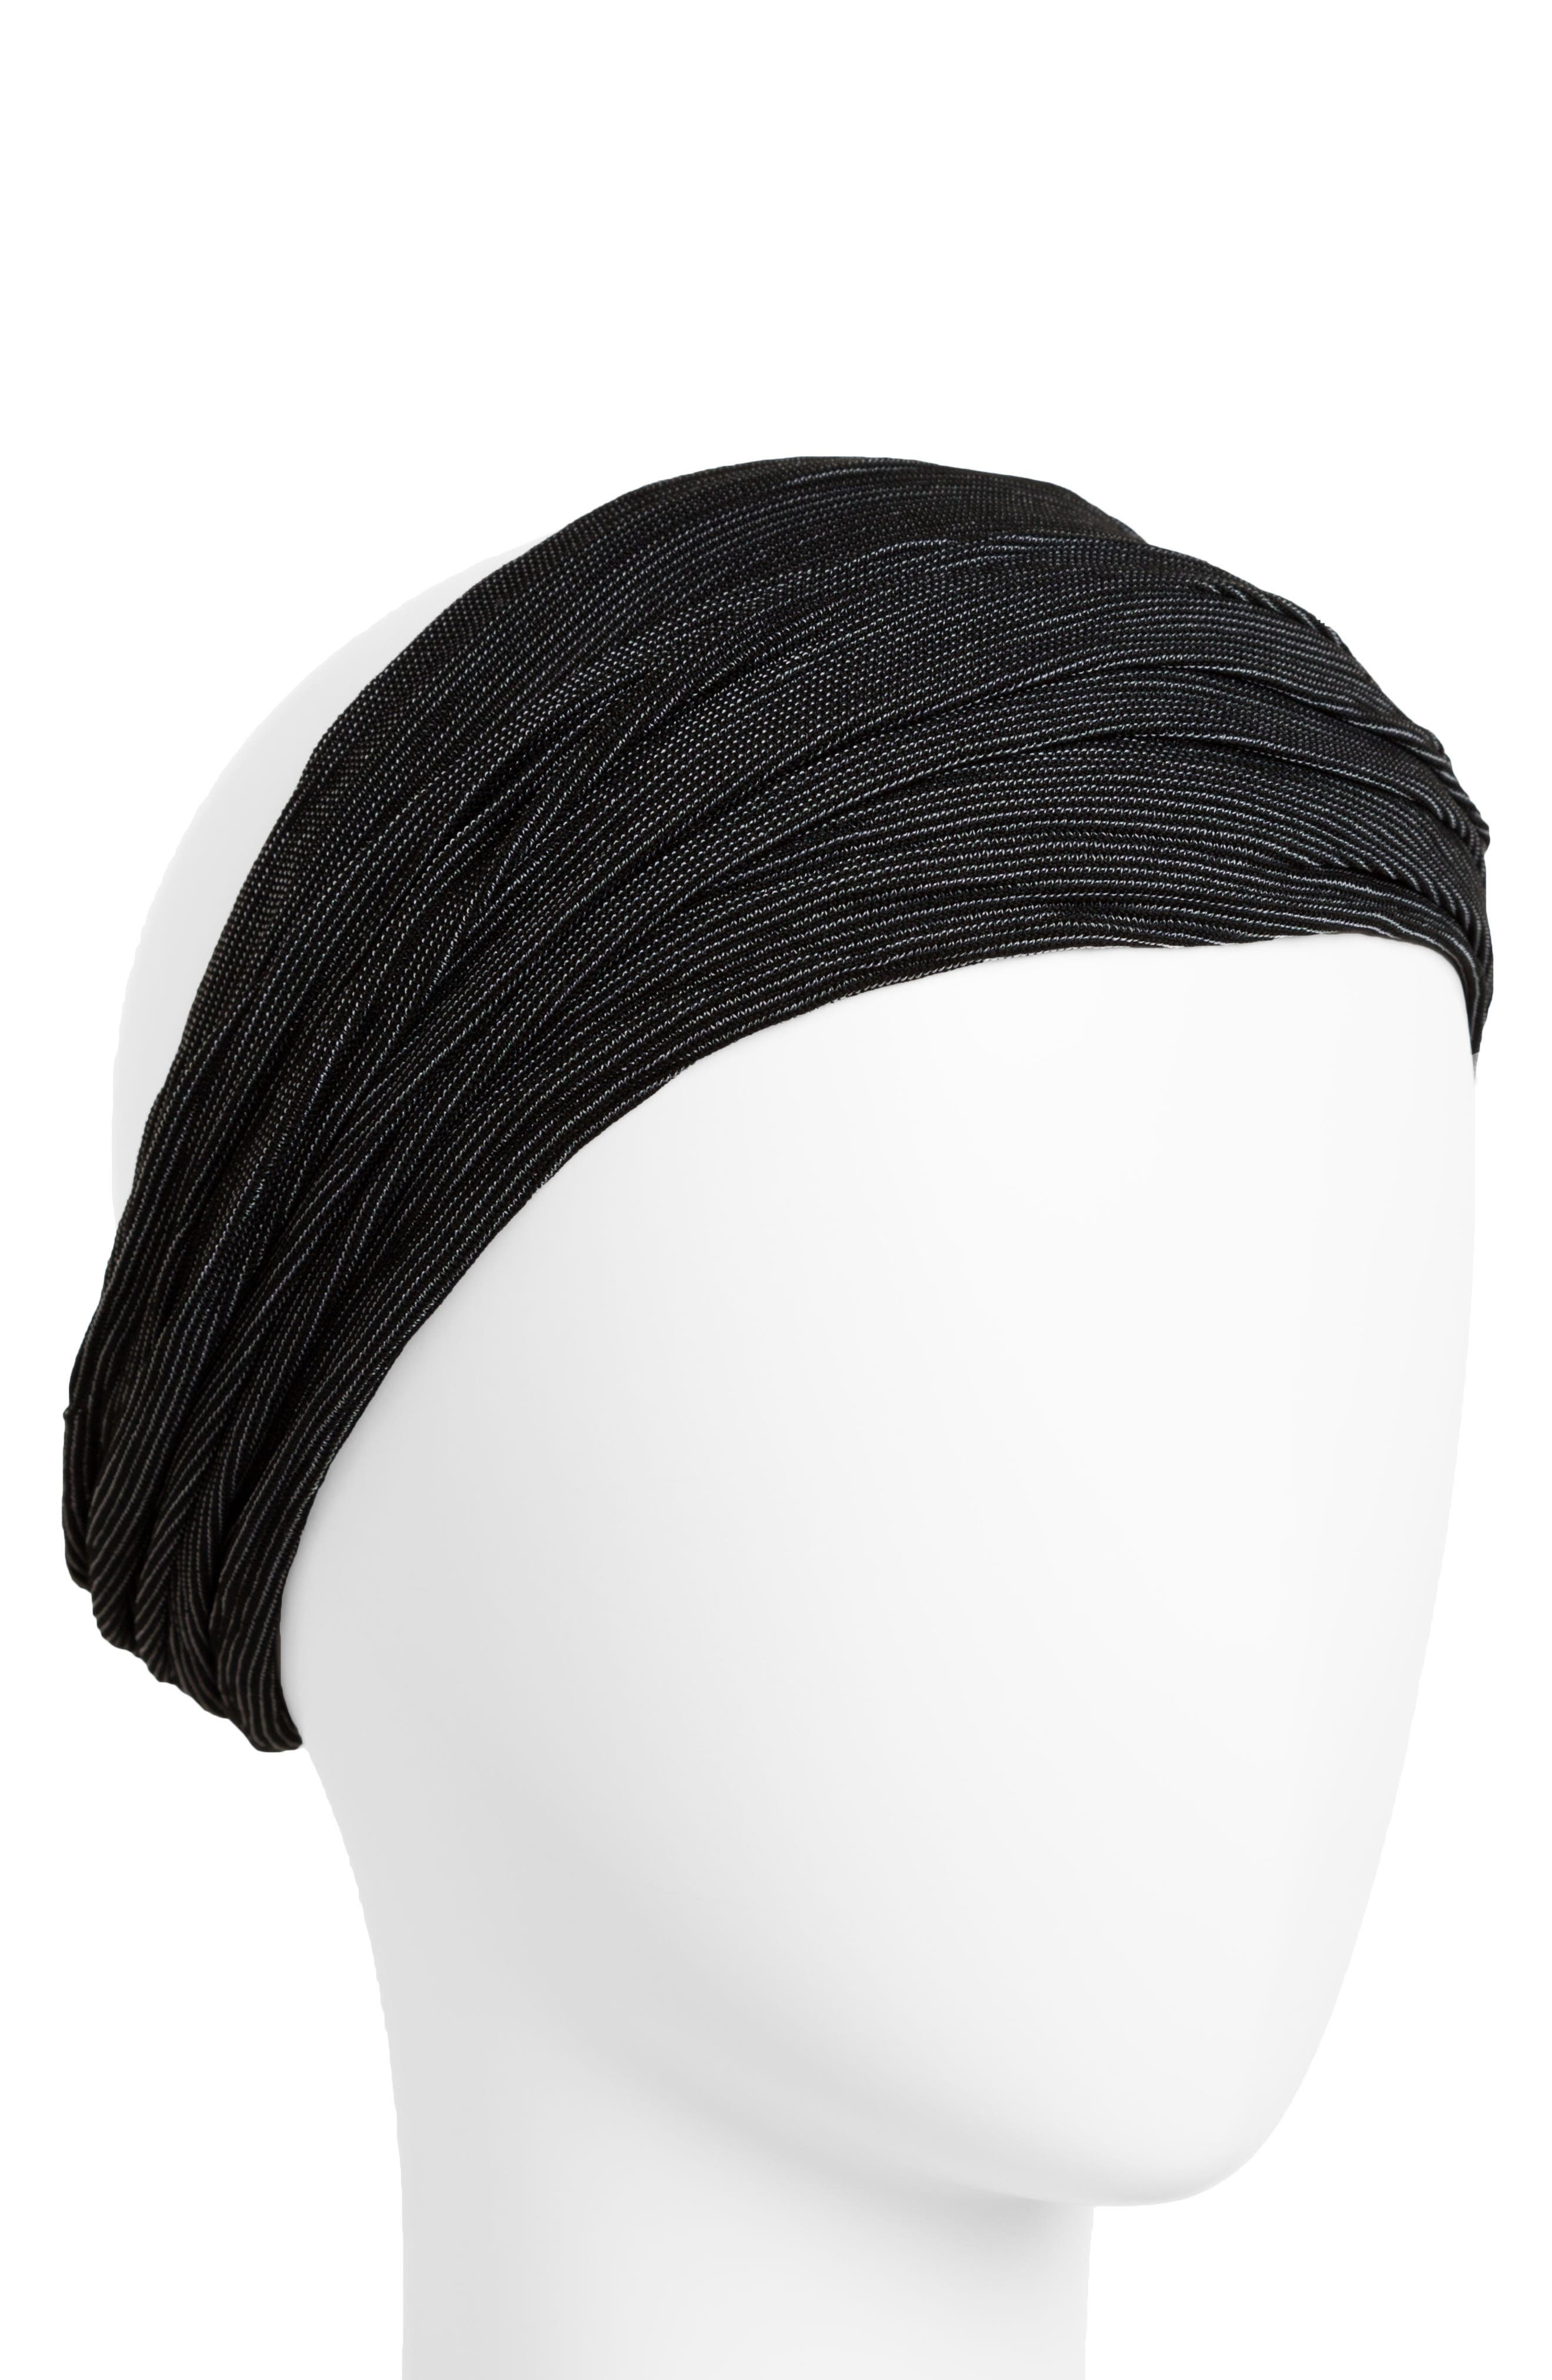 Space Dye Relaxed Turban Head Wrap,                         Main,                         color, Black